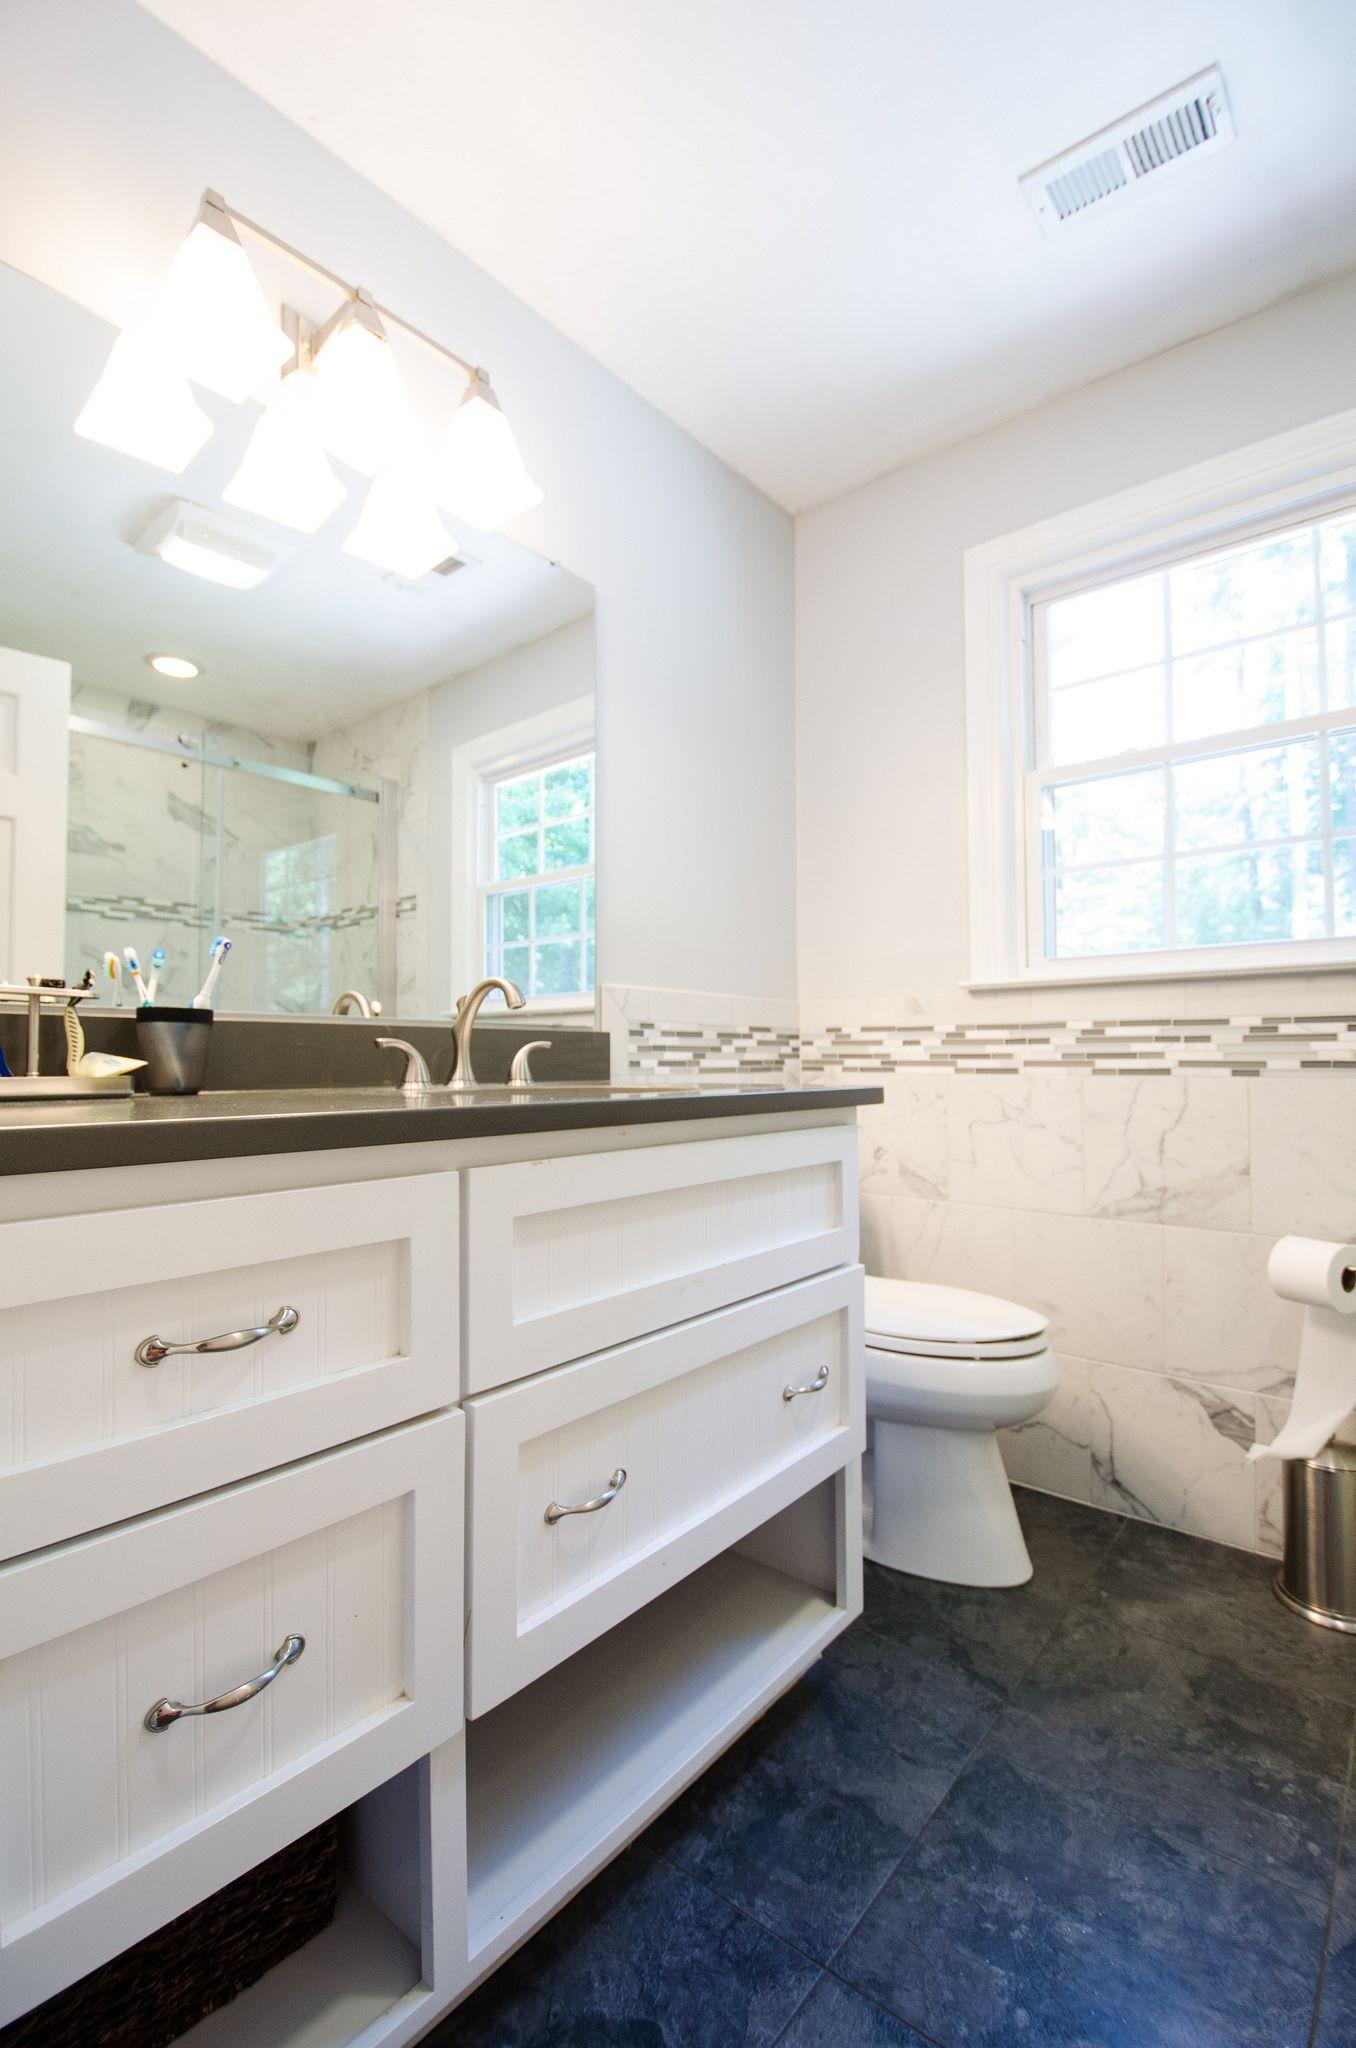 Remodel Bathroom Tile Walls ah107 - after-0060 | solid surface countertops